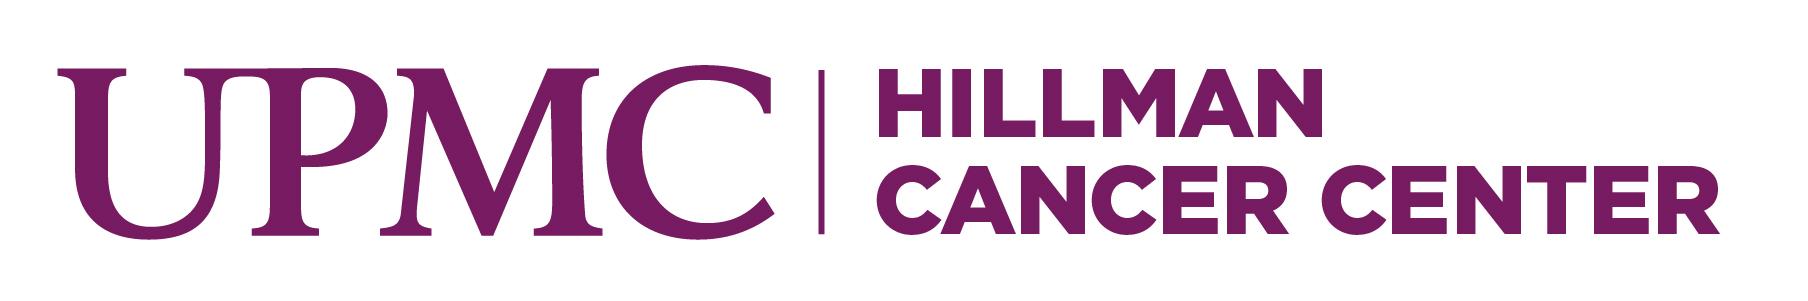 UPMC Hillman Cancer Center